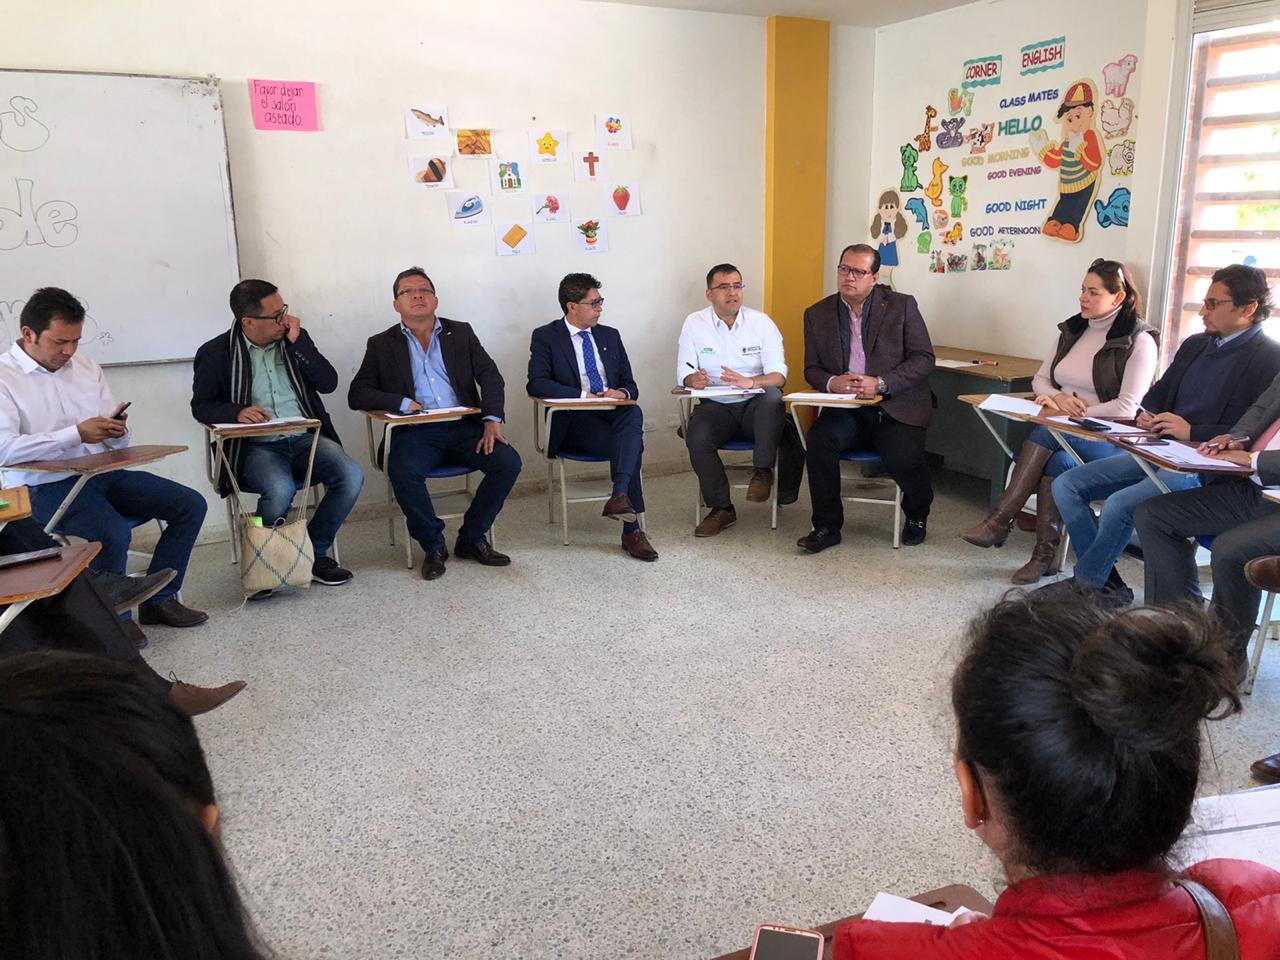 Foto: Juan Diego Rodríguez-UACP